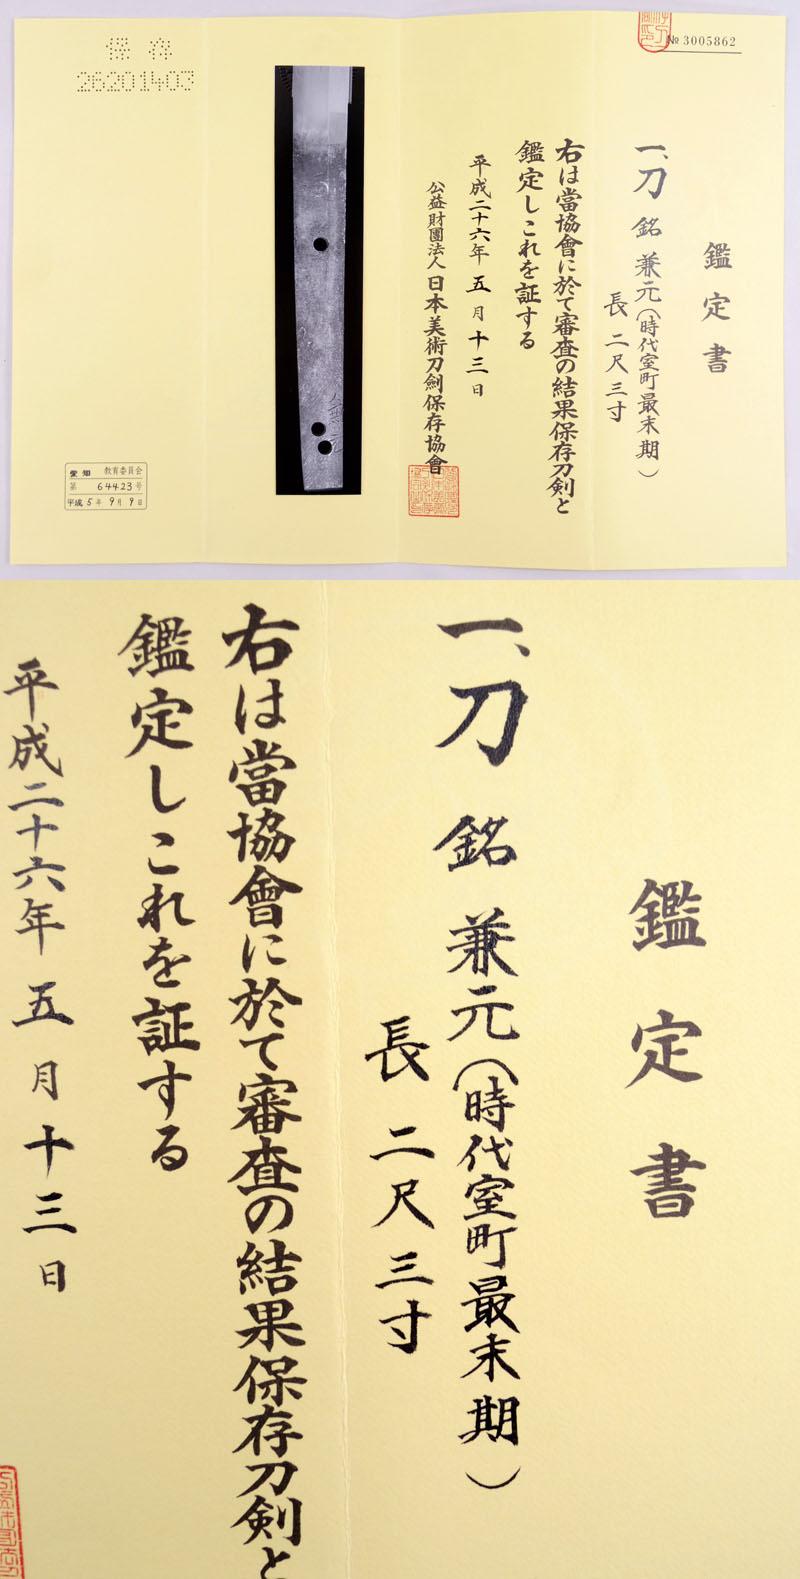 兼元(時代室町最末期) Picture of Certificate